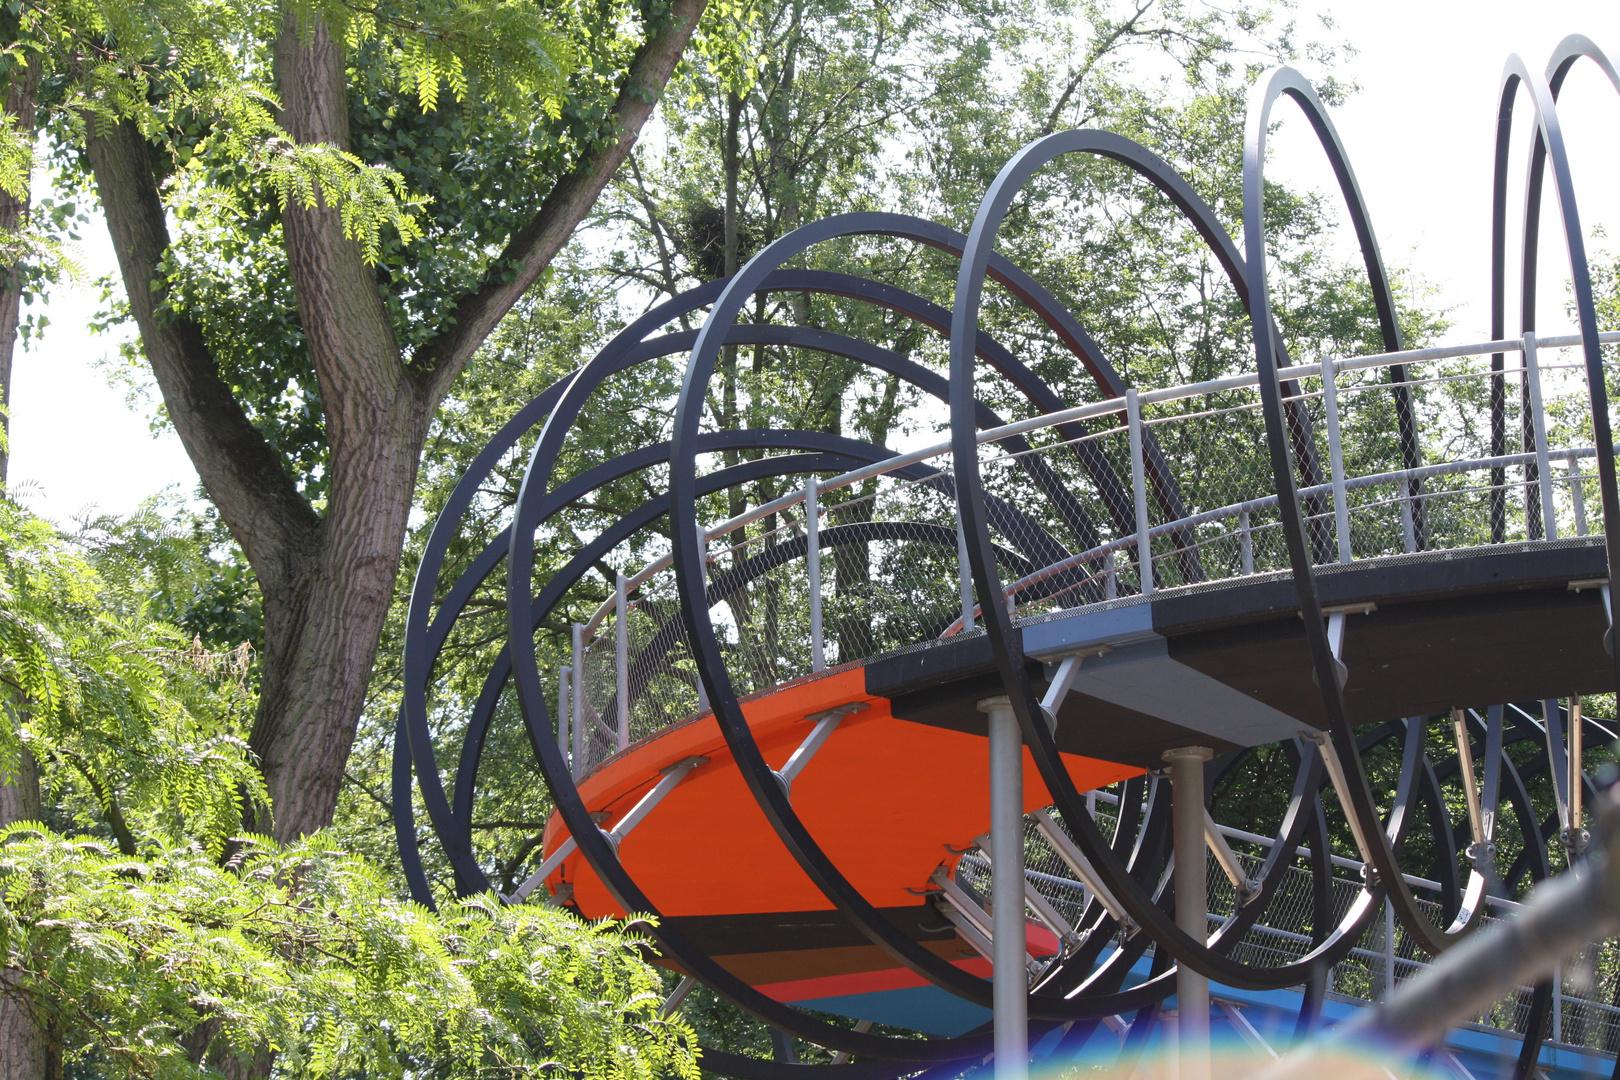 Rehberger Brücke Slinky Springs to fame